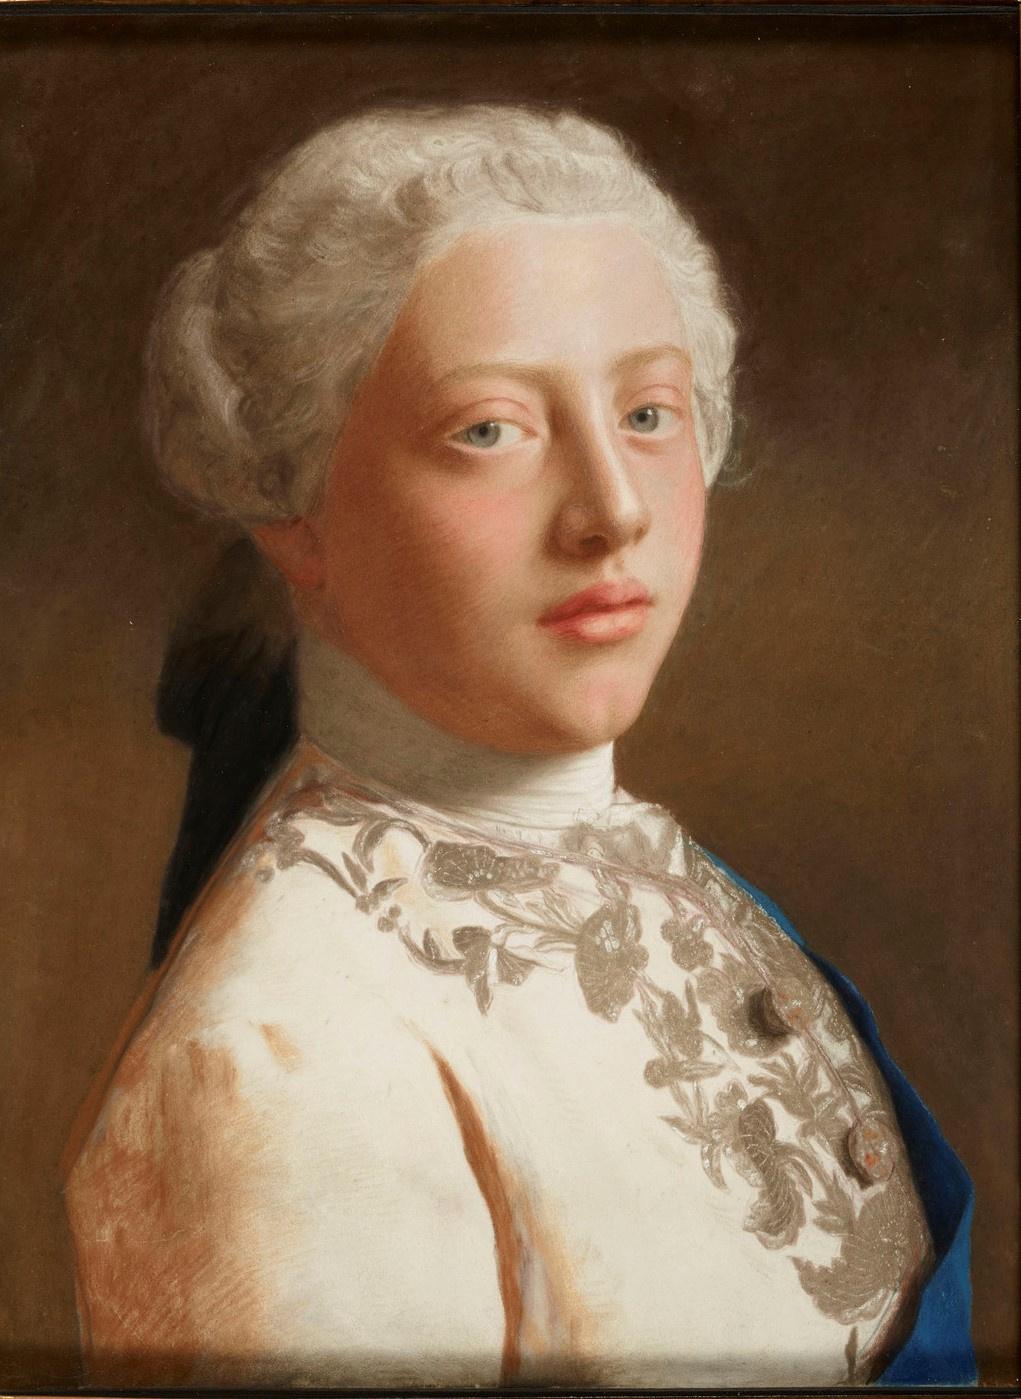 Jean-Etienne Liotard. Portrait of George, Prince of Wales (later George III)